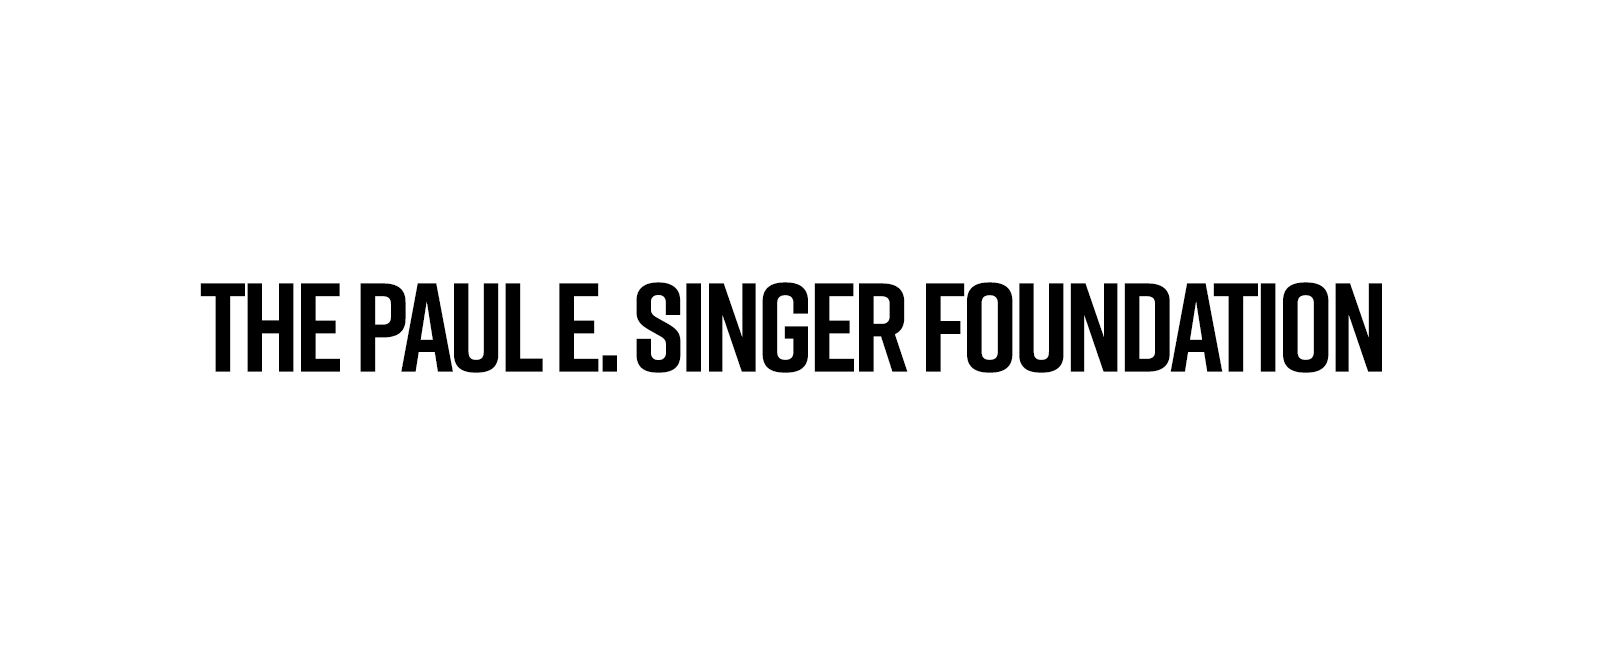 paul-e-signer-foundation-premiere